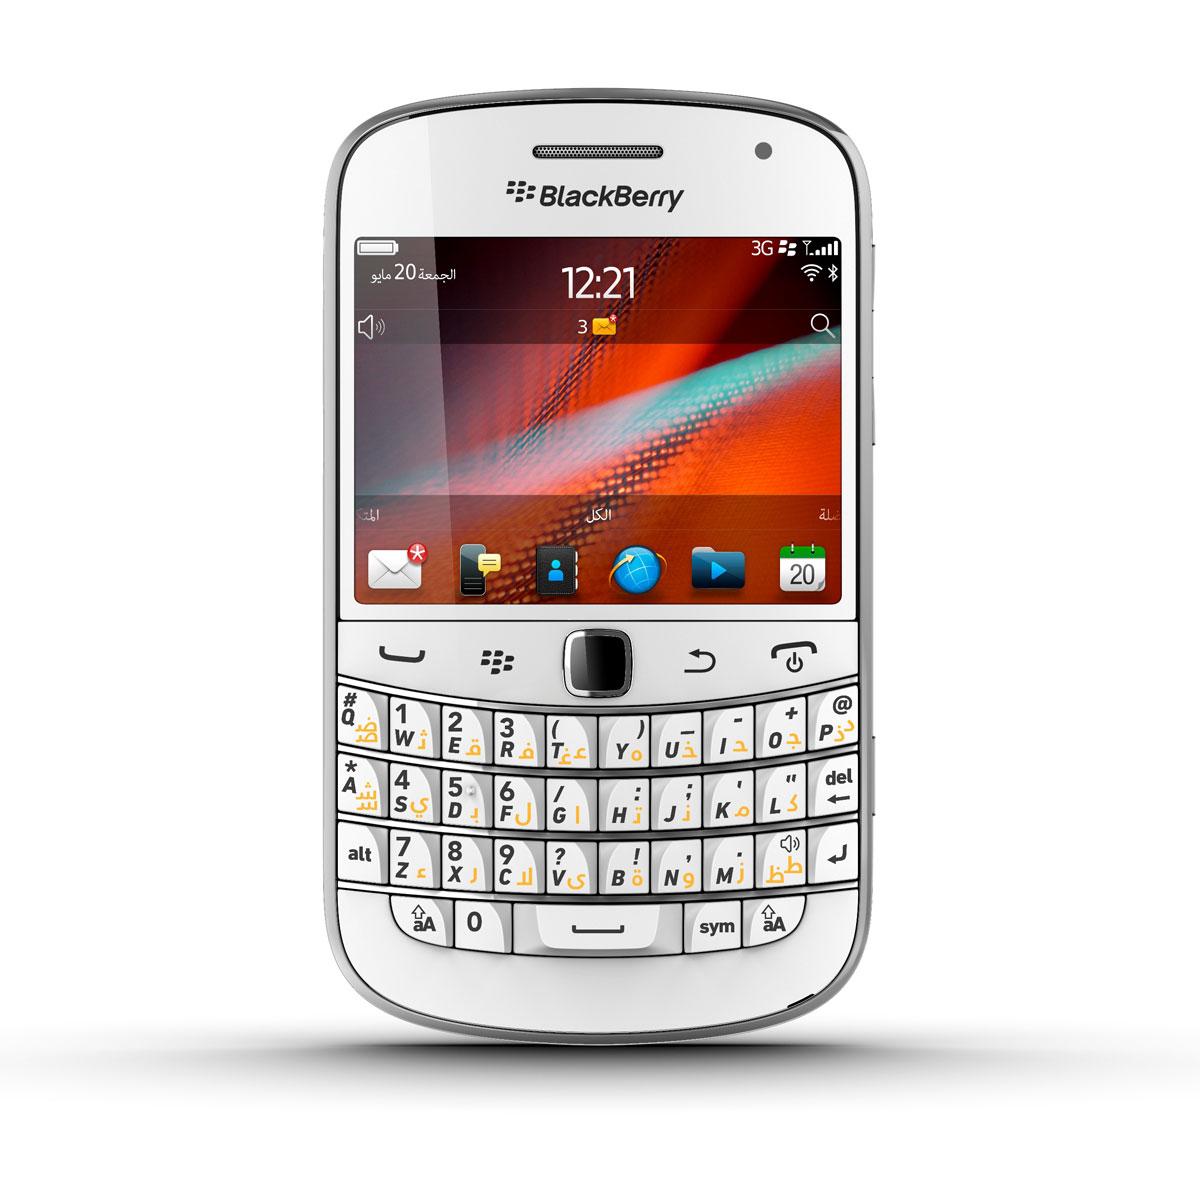 Blackberry bold 9900 qwerty blanc prd 42553 004 achat for Photo ecran blackberry